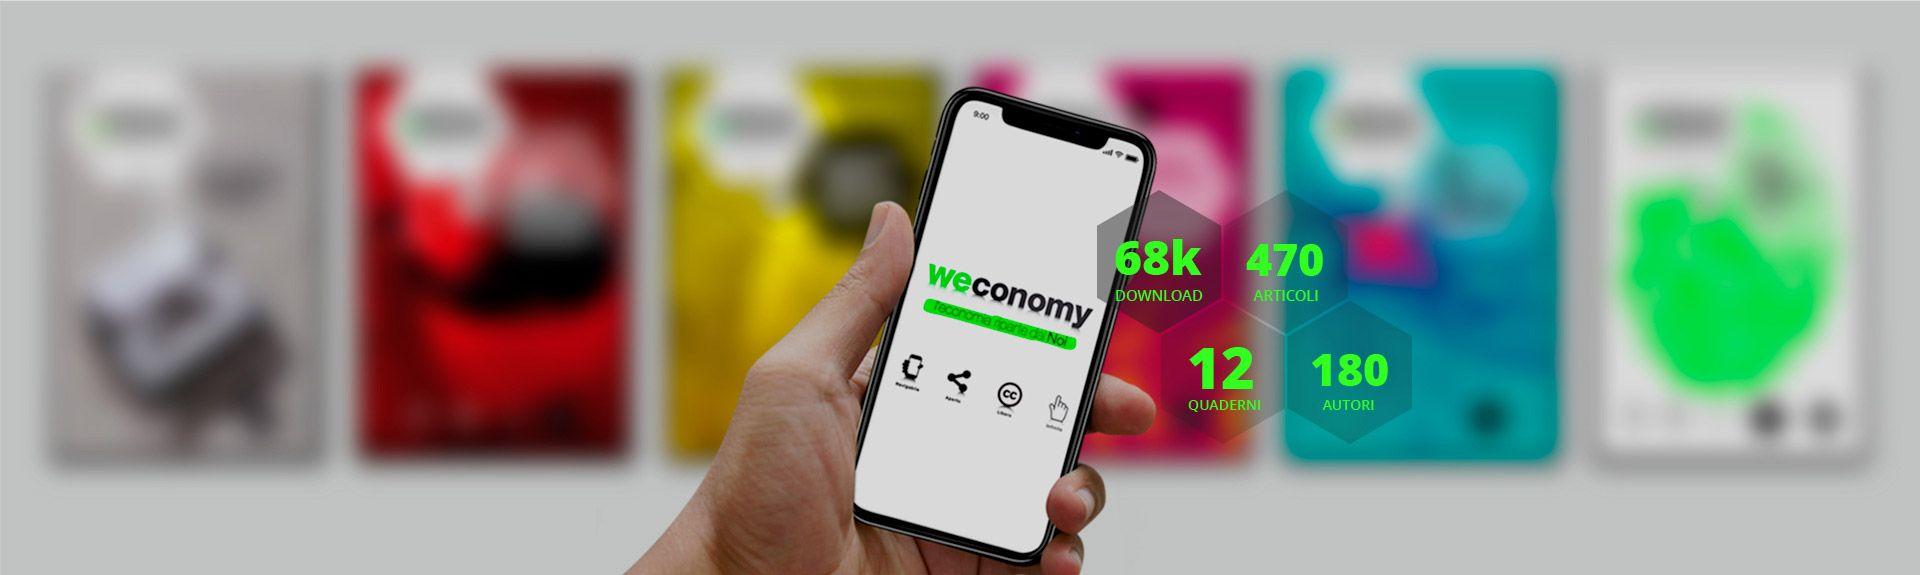 Weconomy: un ecosistema multicanale